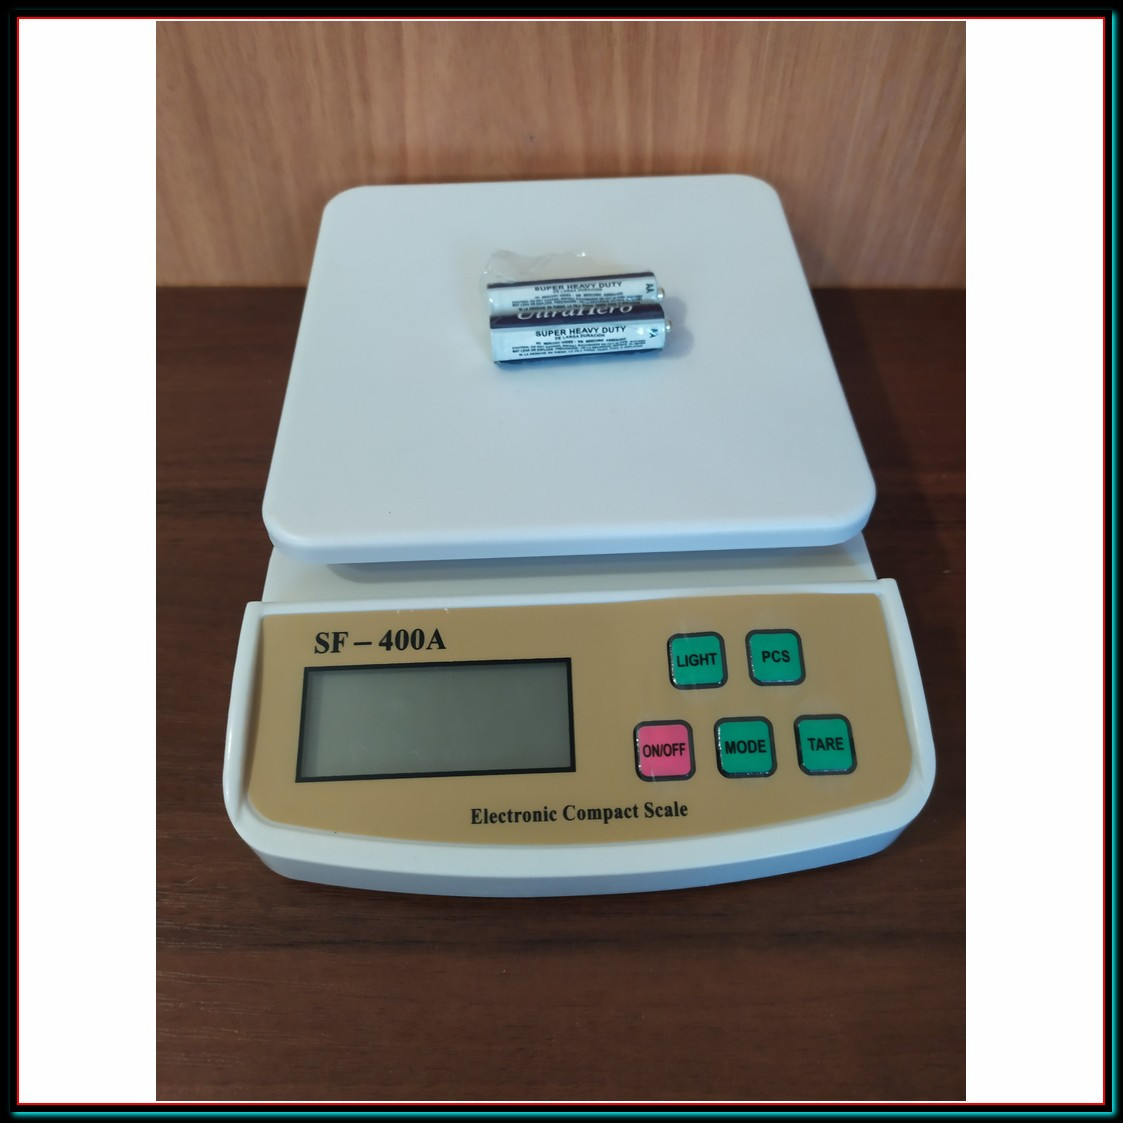 Электронные кухонные весы до 5 кг SF-400A с подсветкой + батарейки